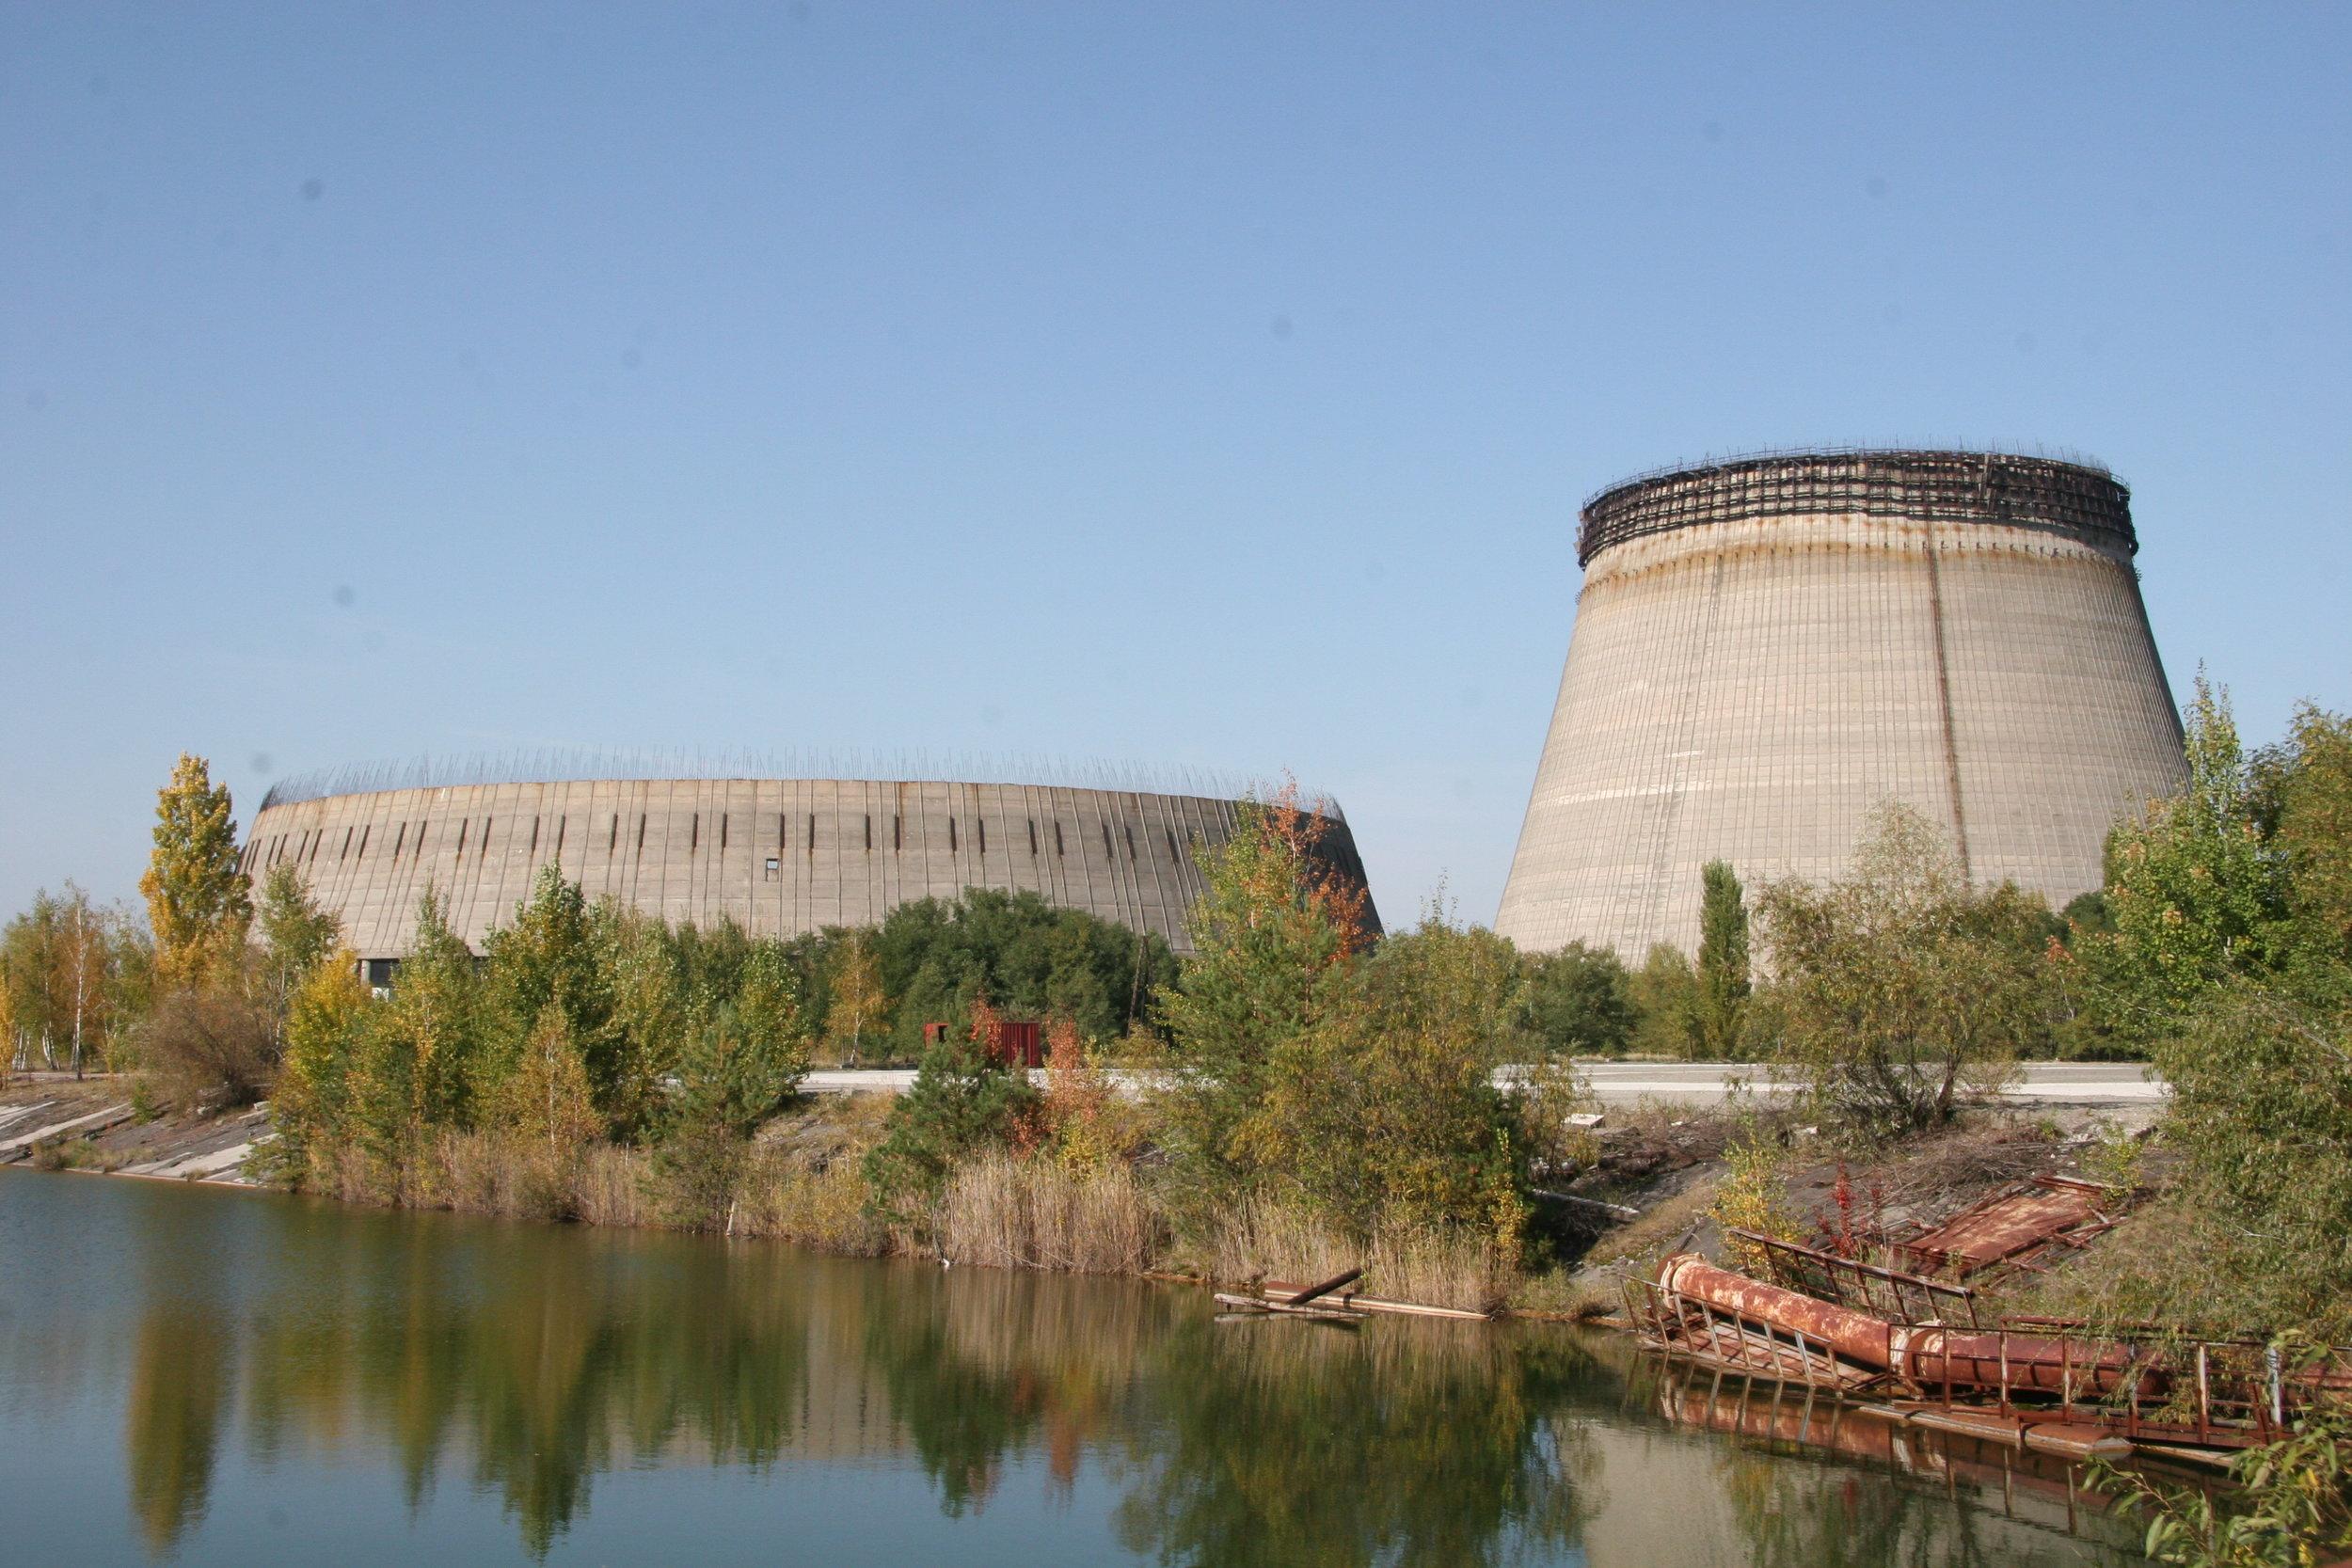 Abandonded No. 5 & 6 reactors